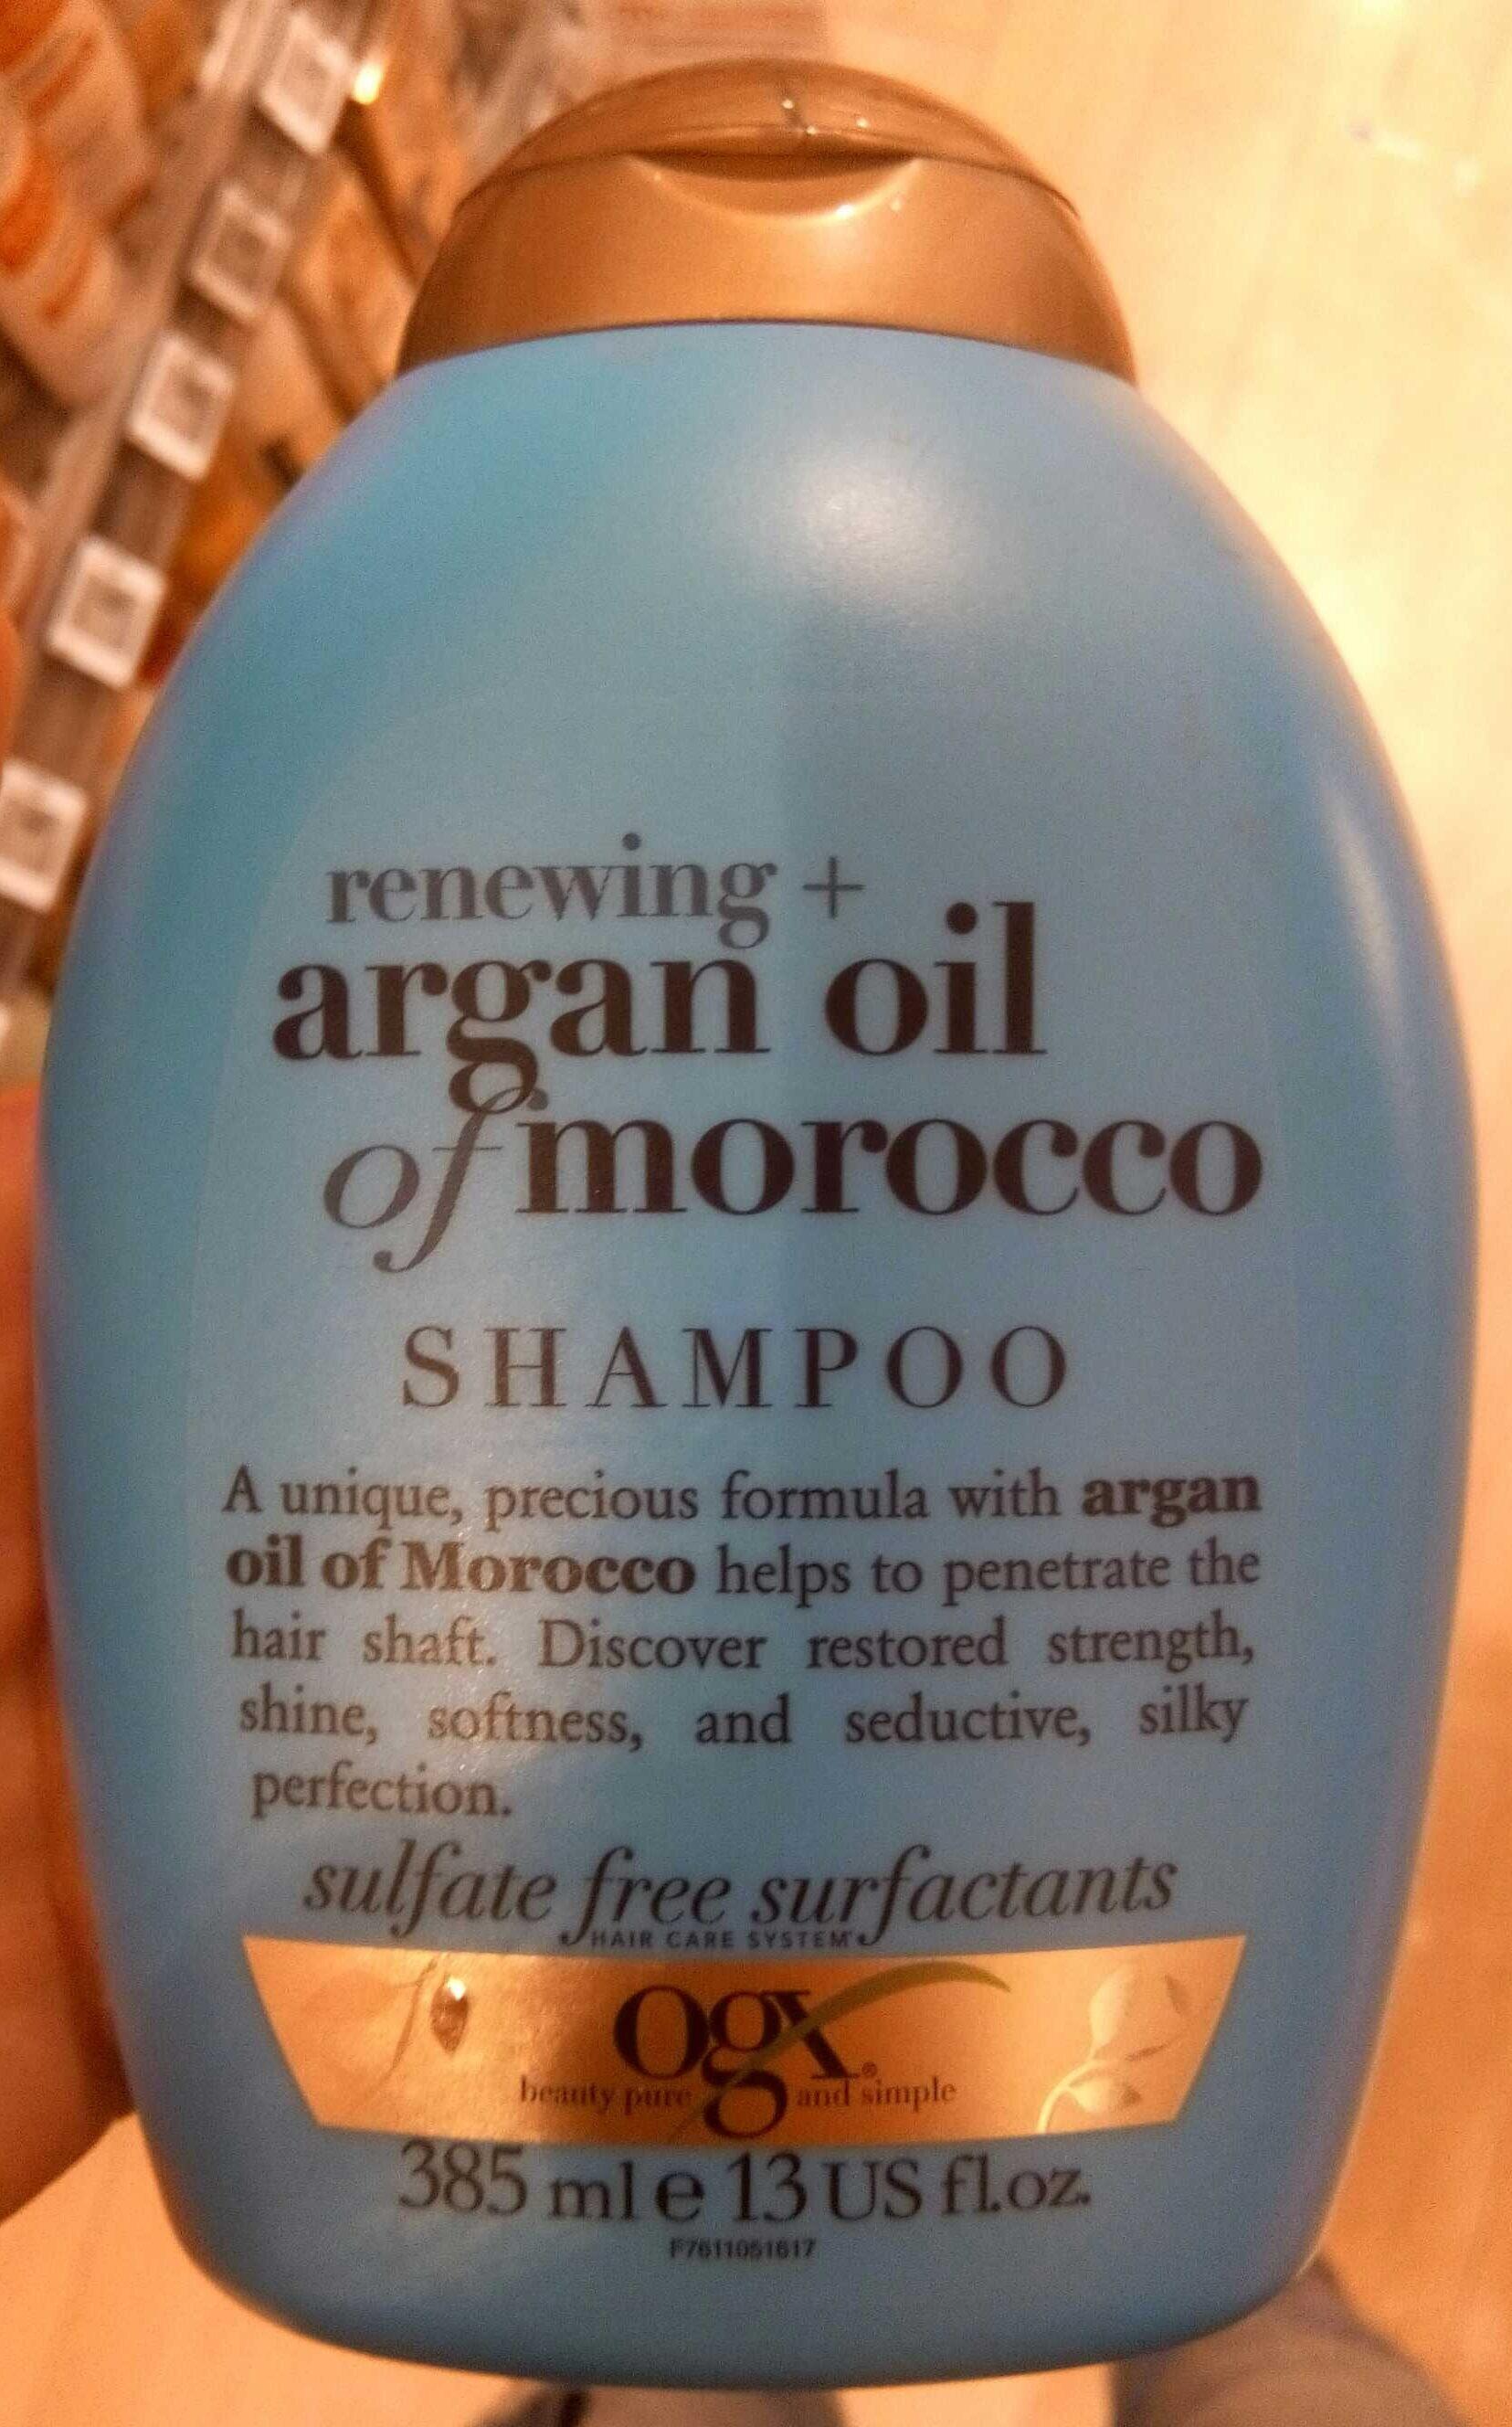 Argan oil of morocco Shampoo - Product - fr